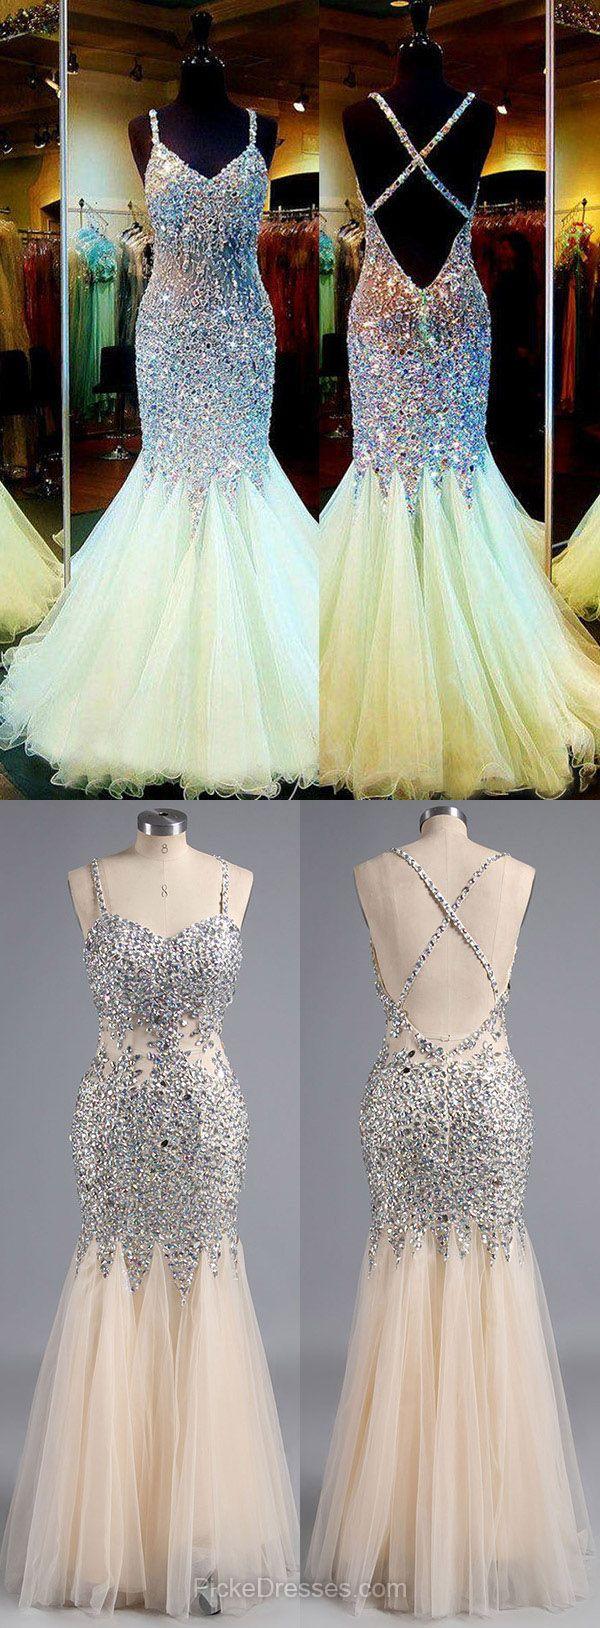 best vestido images on pinterest grad dresses long prom